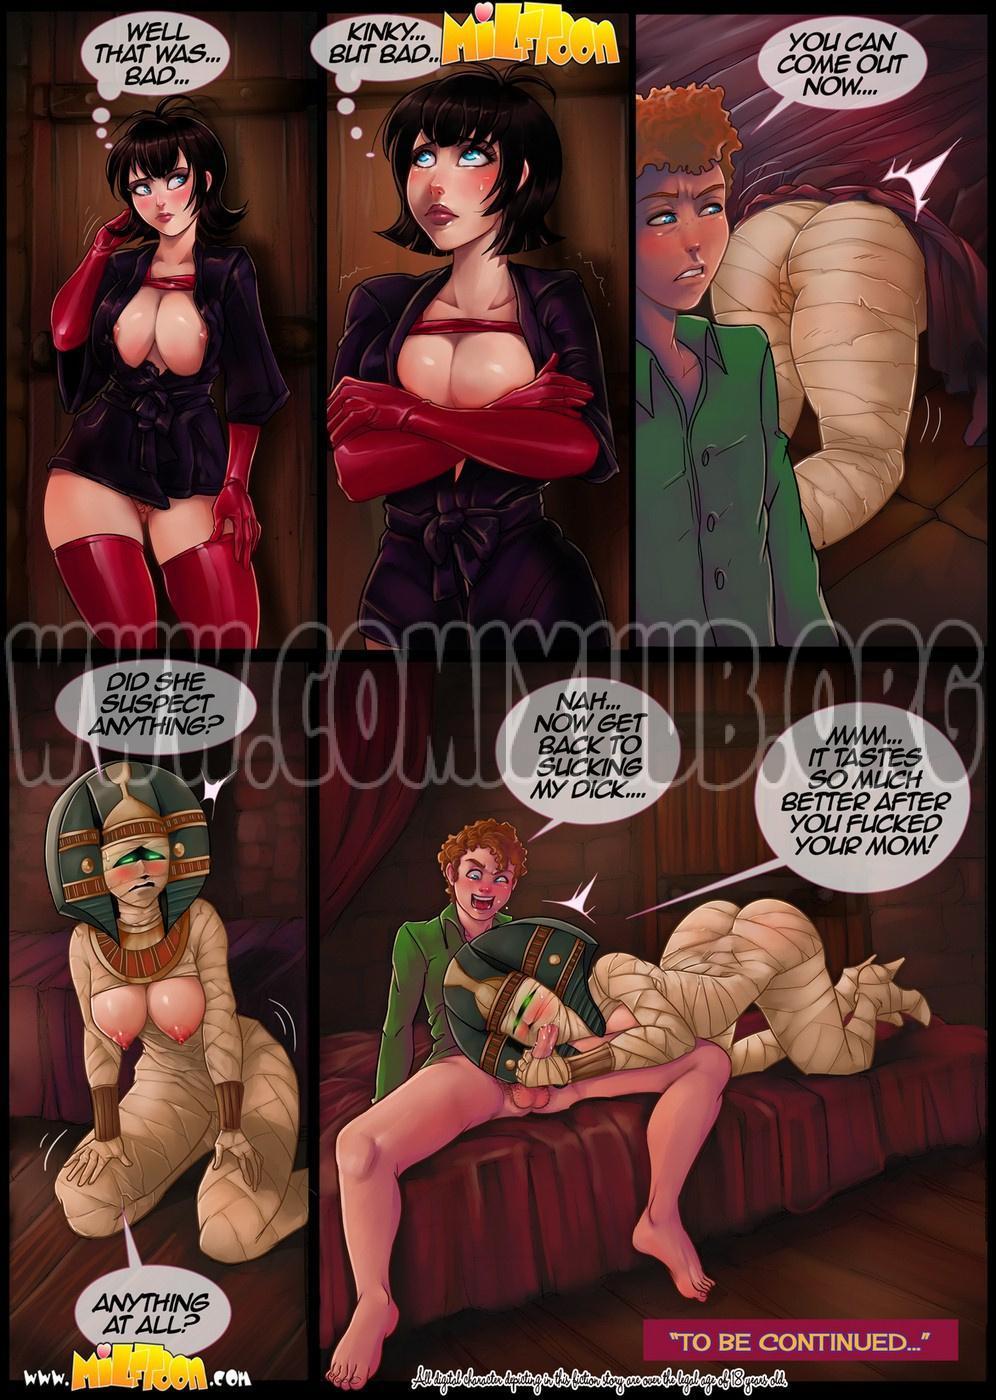 Transylvania Milf 2 Oral sex, Anal Sex, Big Tits, Blowjob, Fantasy, incest, Latex, MILF, Monster Girls, Stockings, Straight, Straight Shota